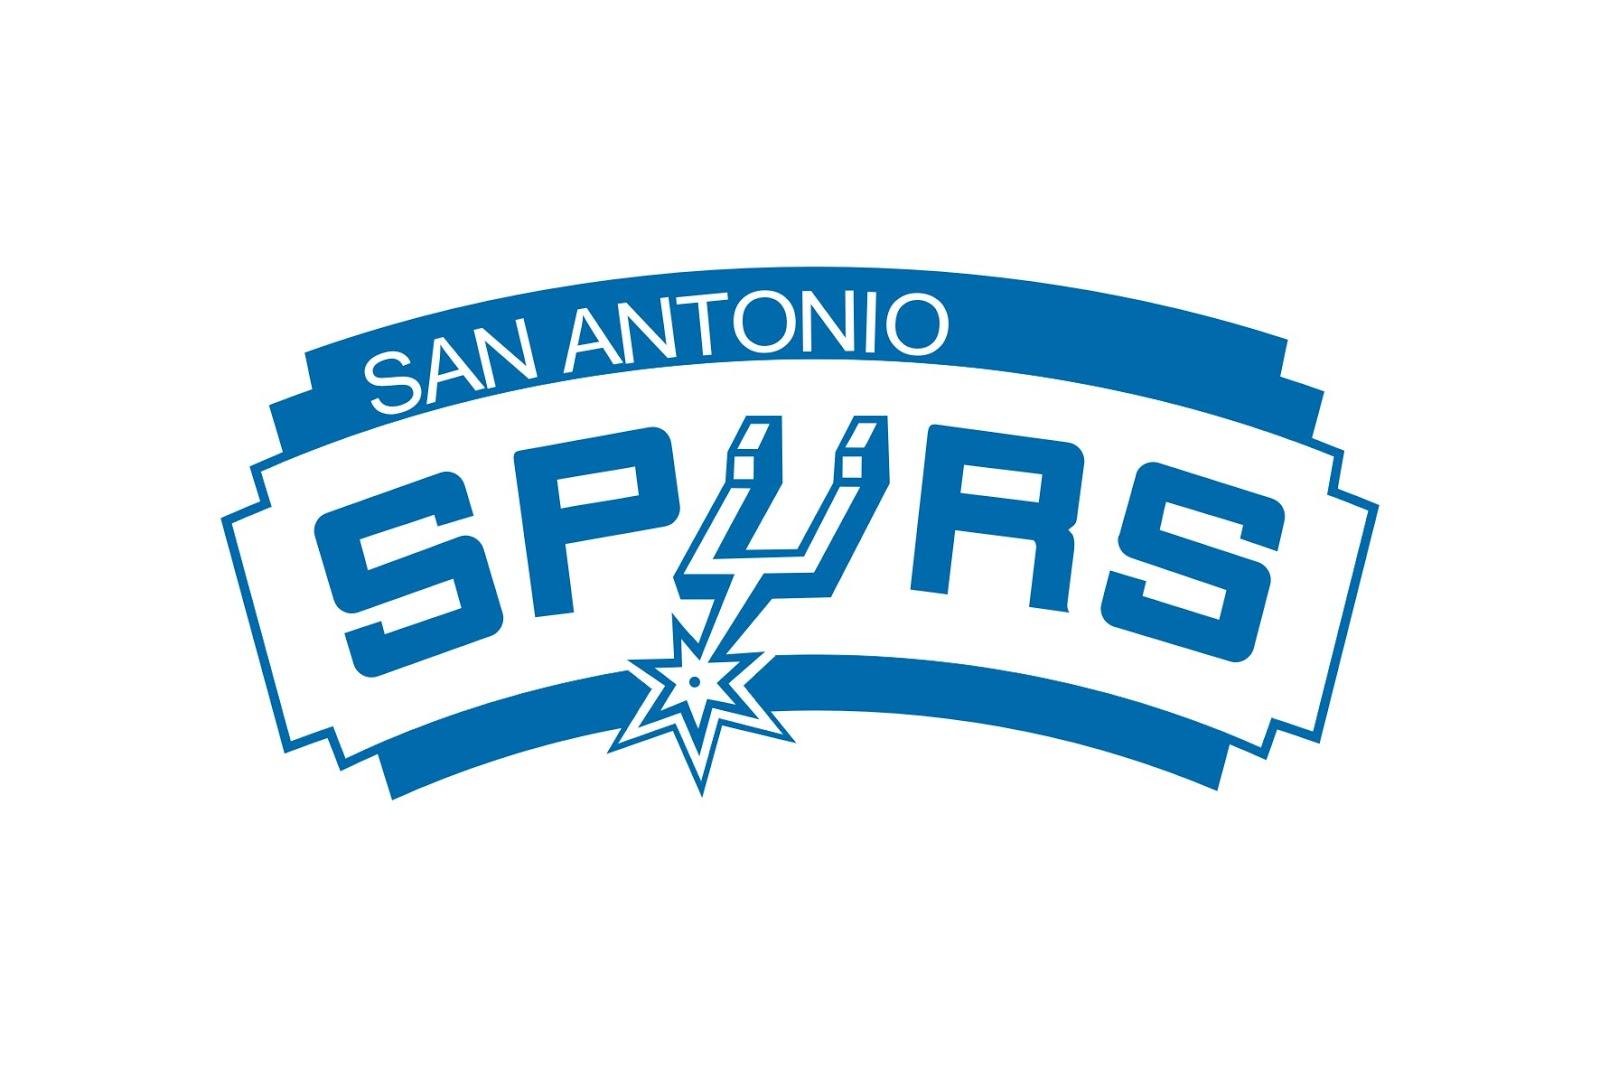 San Antonio Skyline Silhouette Free vector silhouettes Pictures of san antonio spurs logo